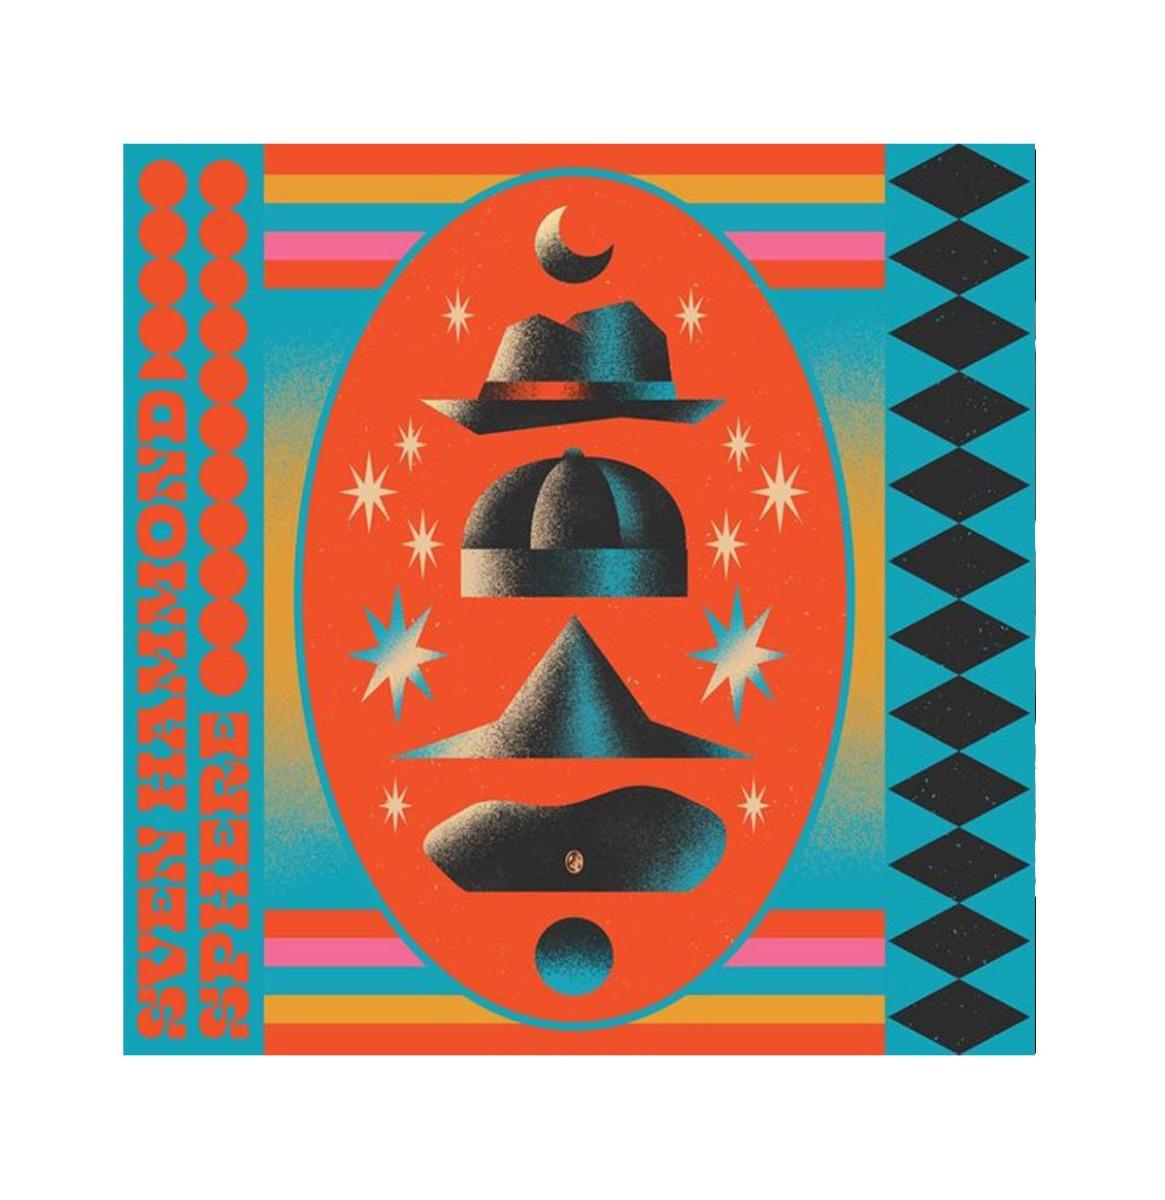 Sven Hammond - Sphere LP